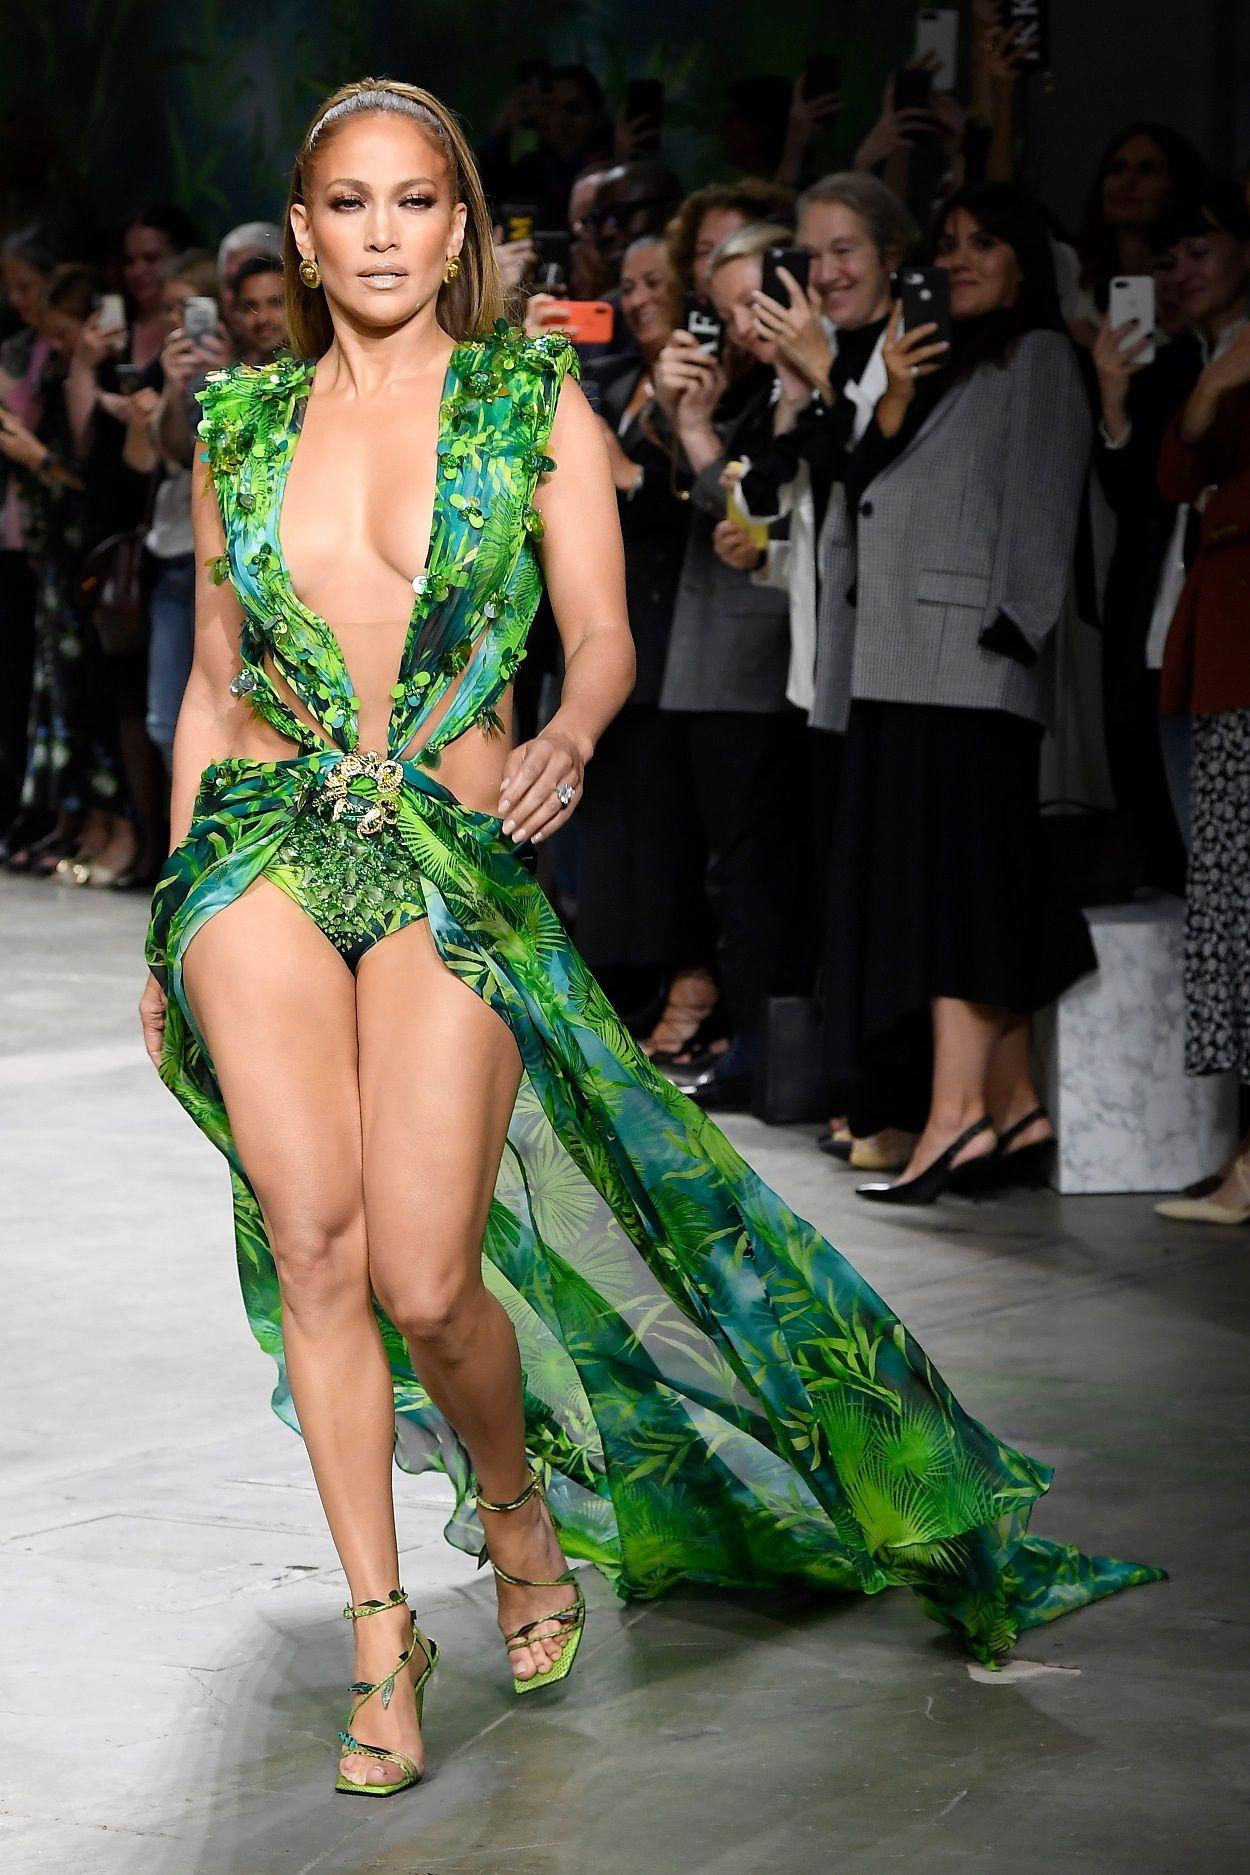 Jennifer Lopez Runway On Versace Show Spring Summer 2020 Milan Fashion Week Italy Jennifer Lopez Bikini Milan Fashion Week Fashion [ 1875 x 1250 Pixel ]